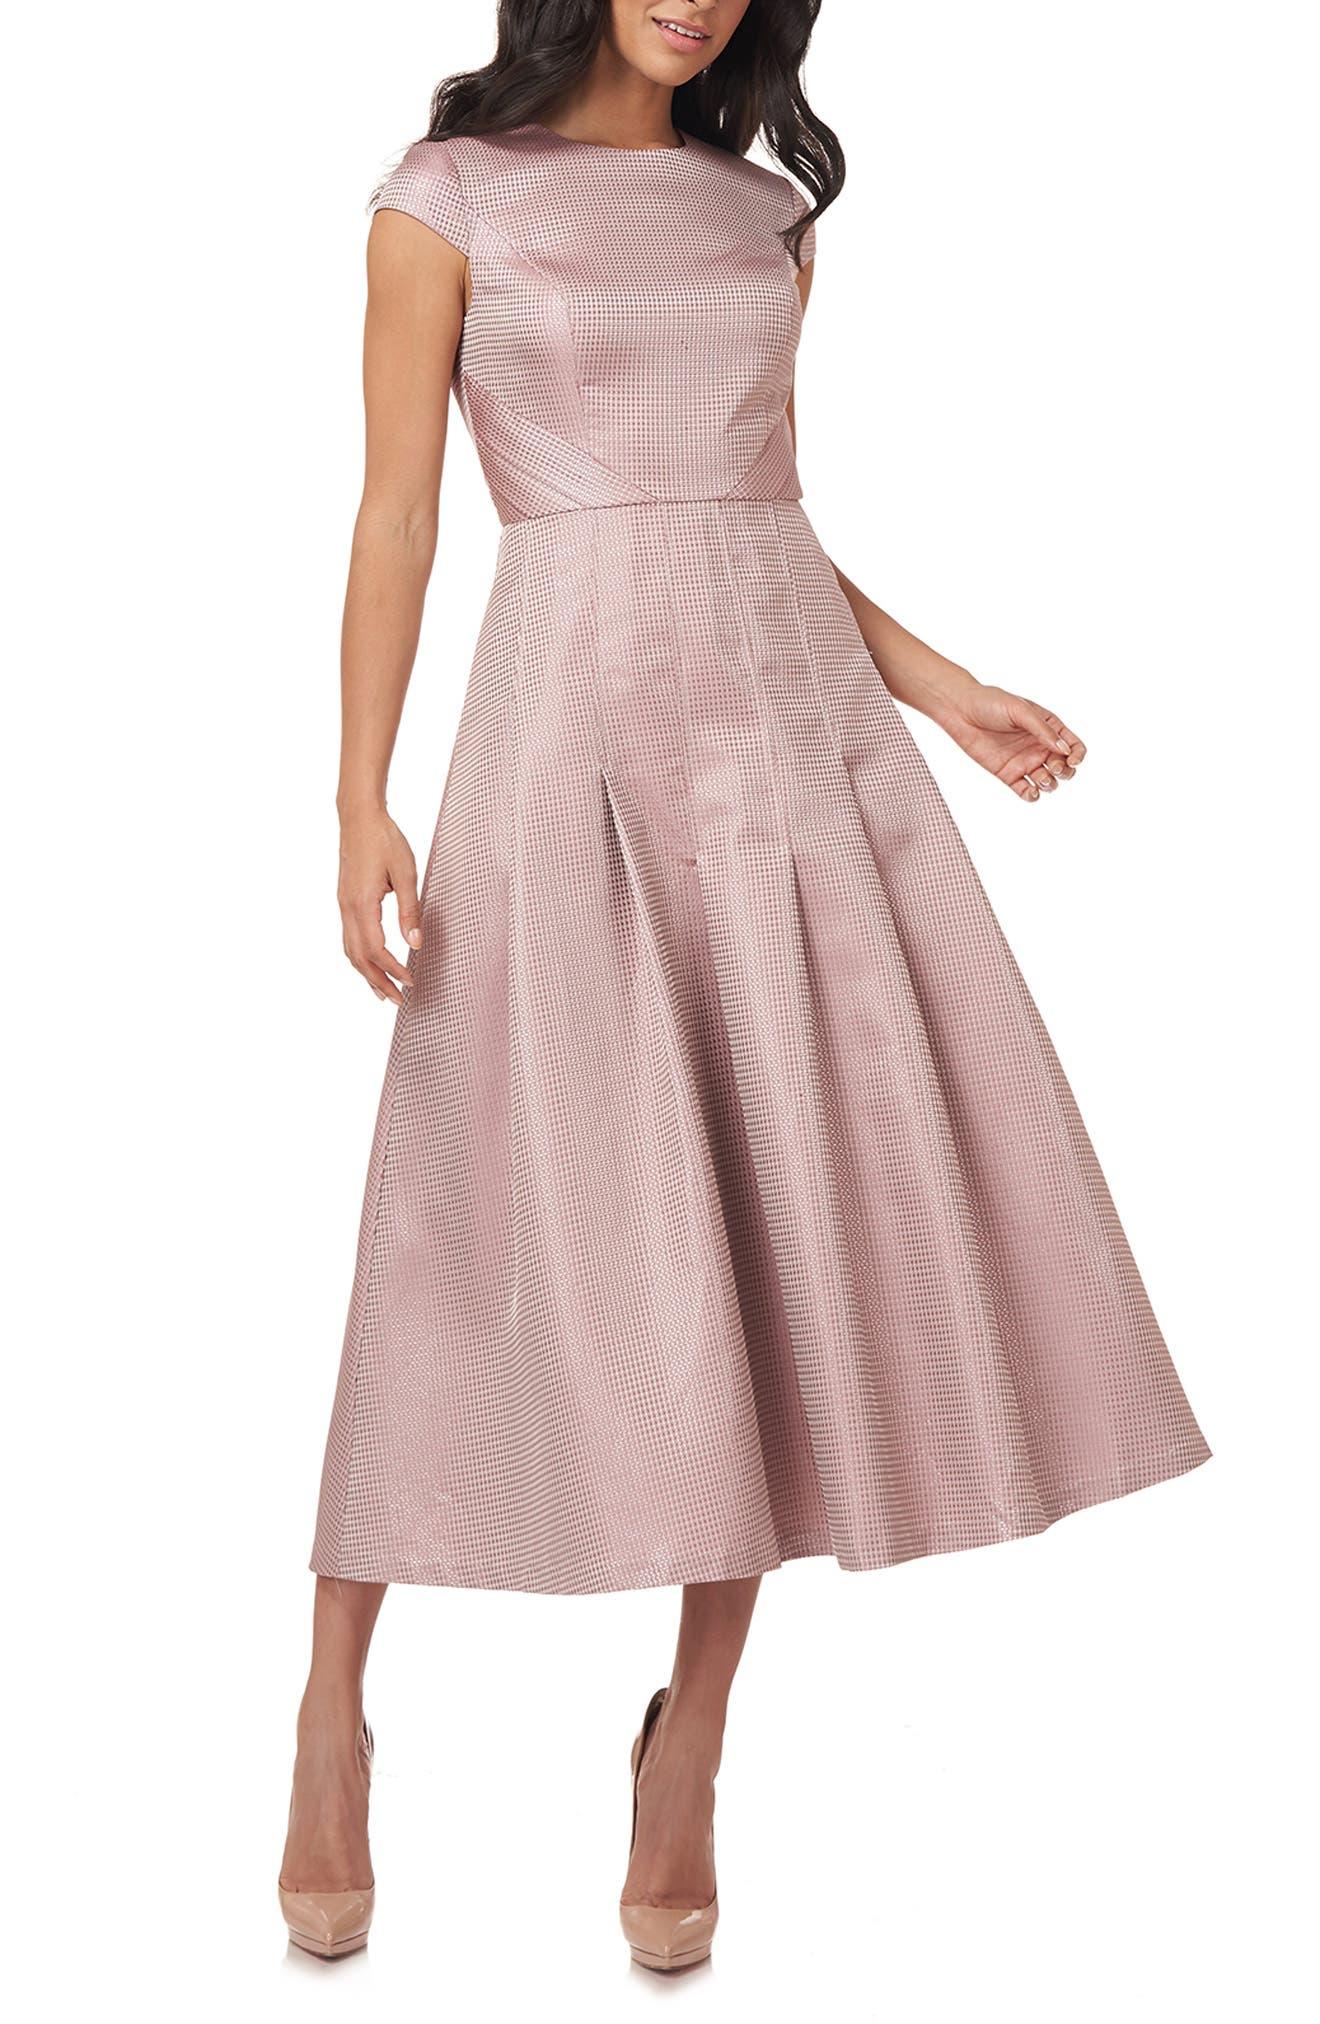 Blake Jacquard Cocktail Dress